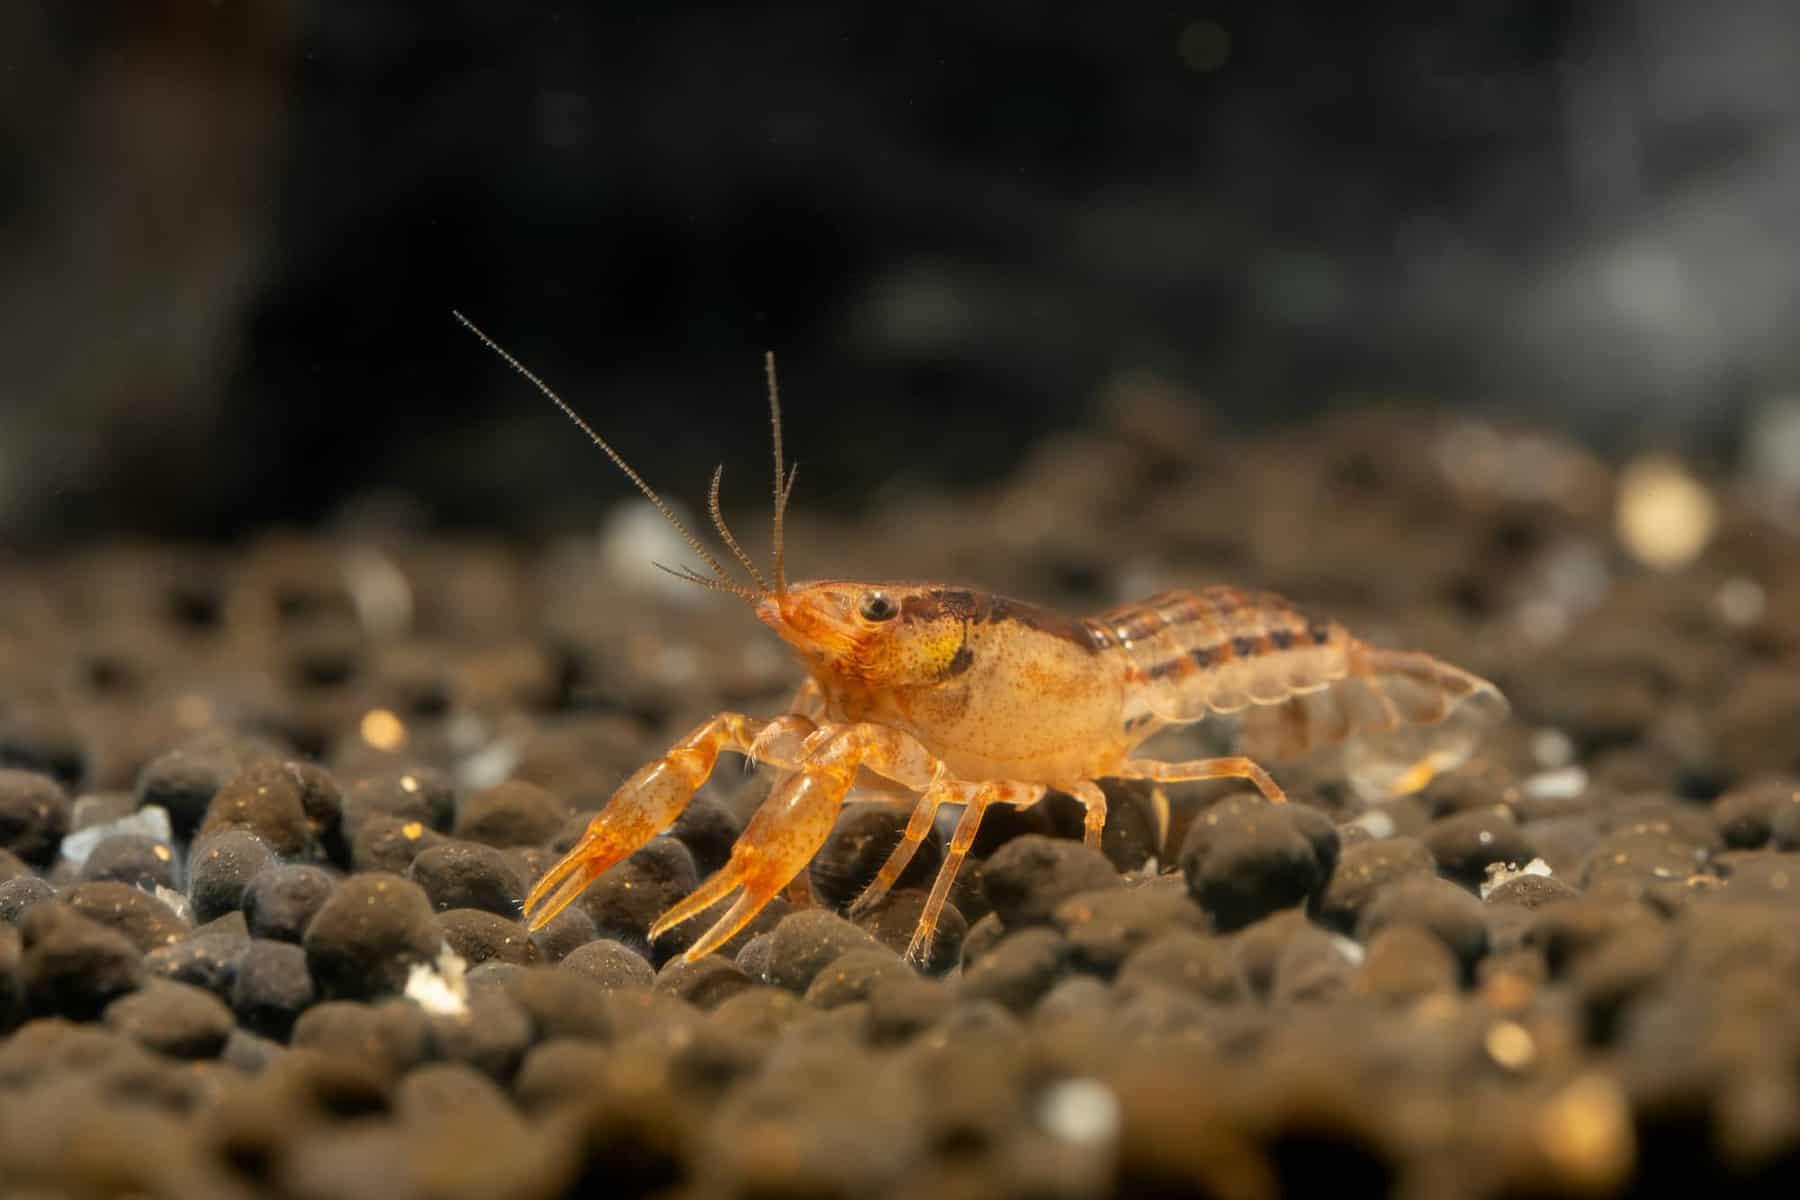 Dwarf Orange Crayfish